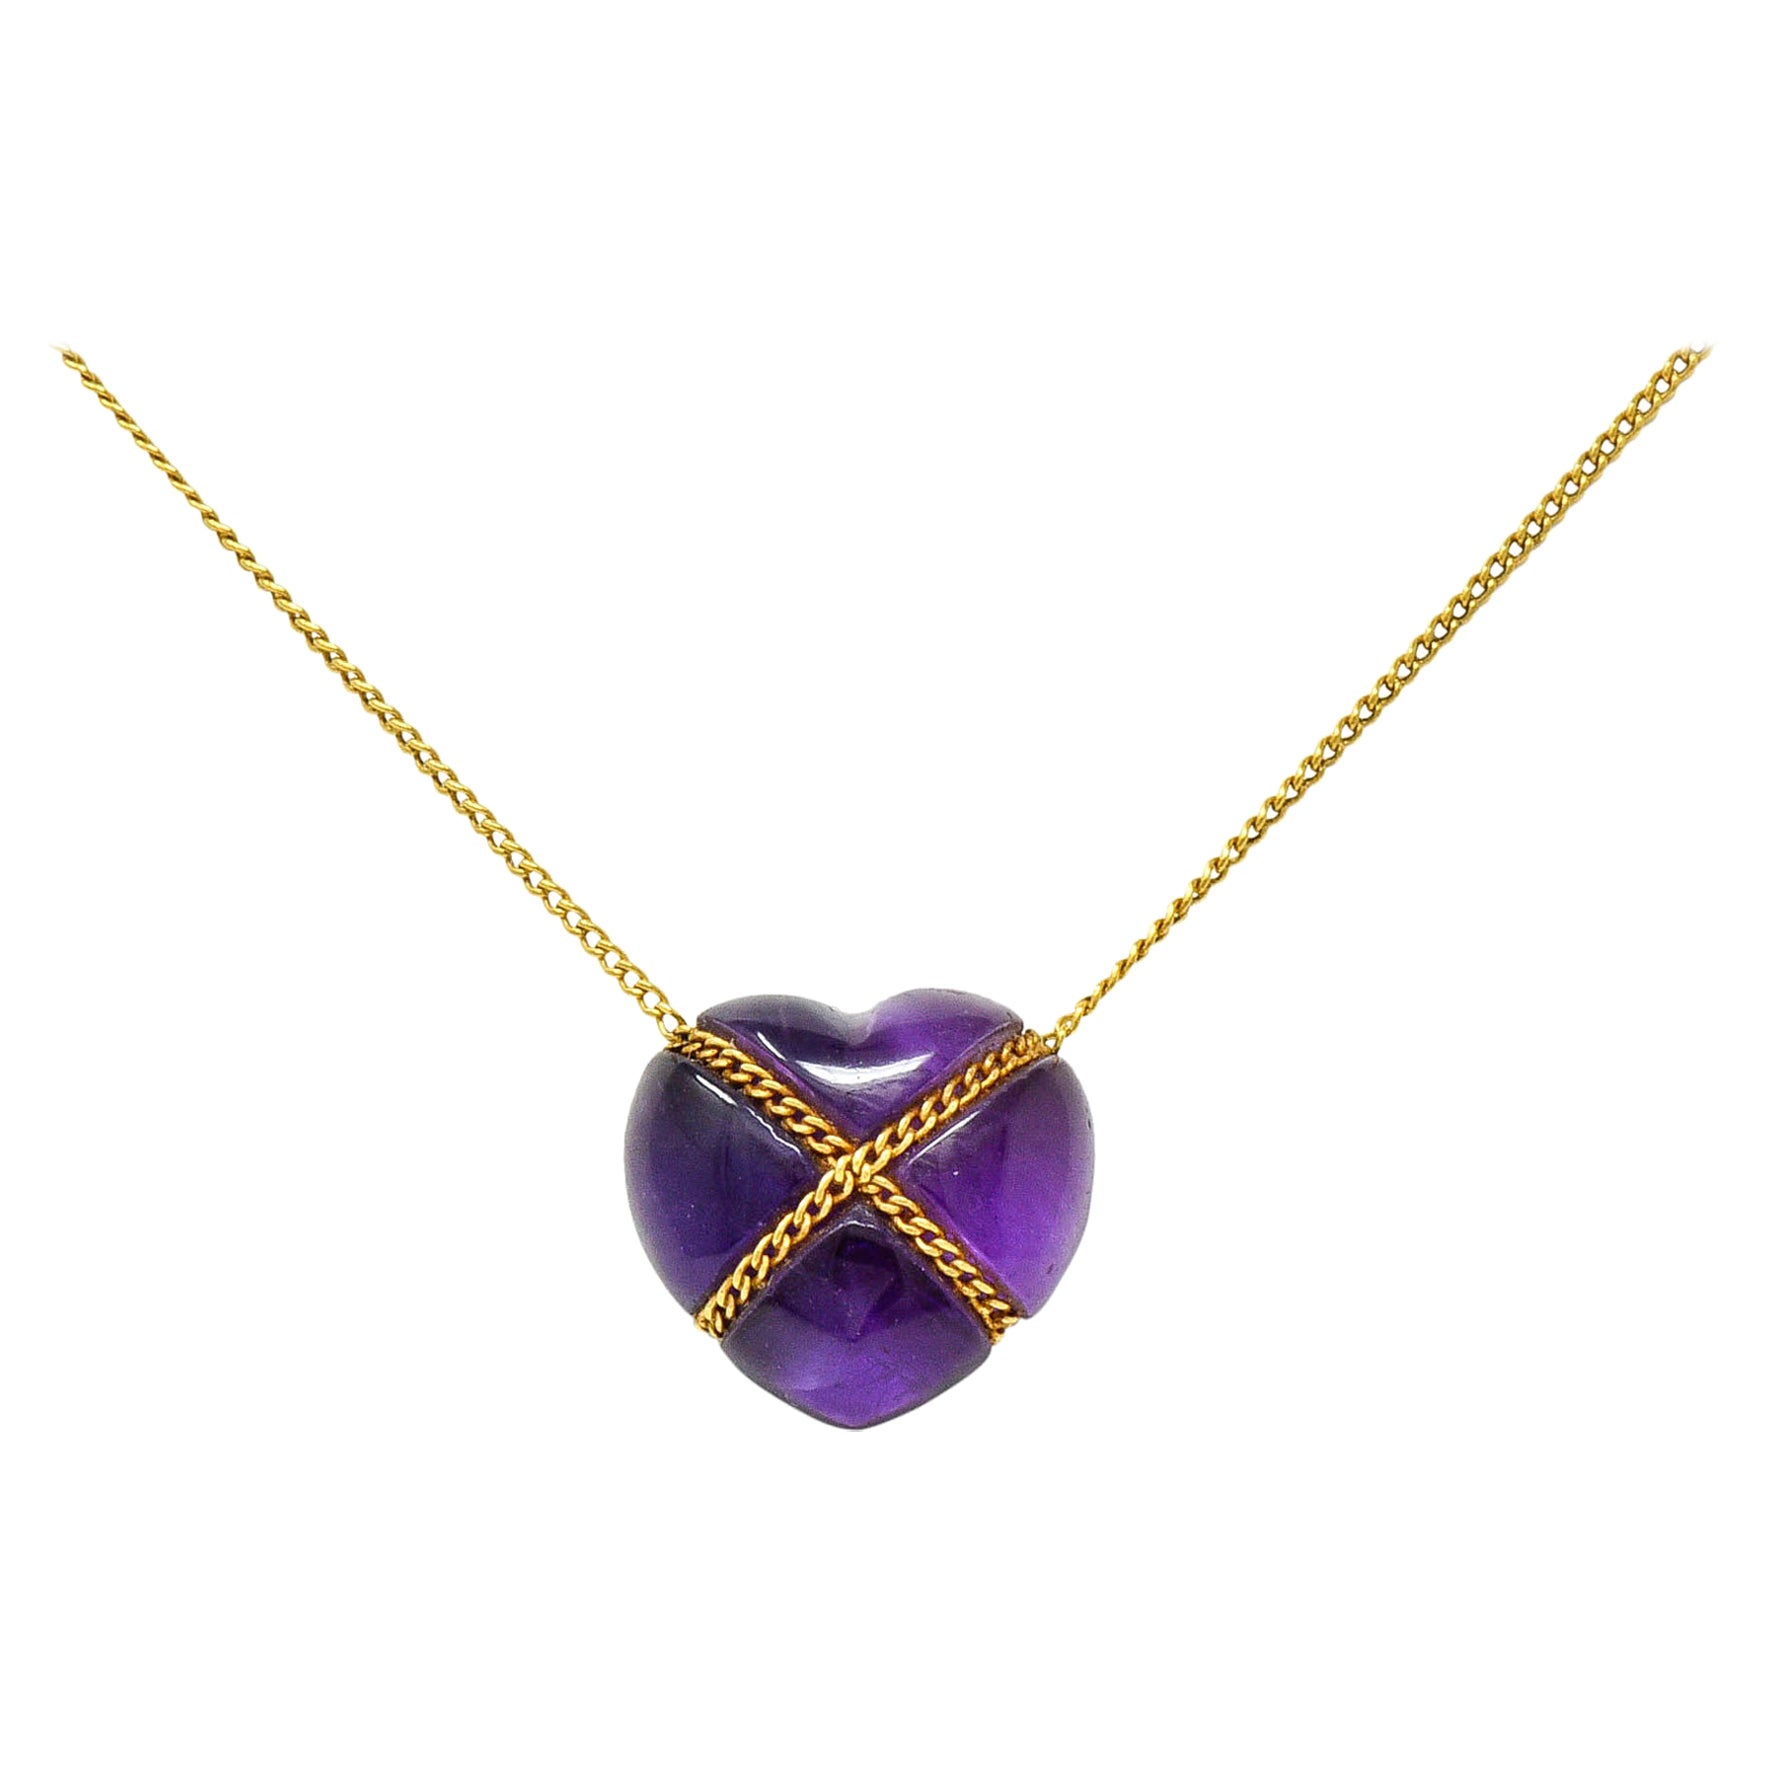 Tiffany & Co. Amethyst 18 Karat Gold Cross My Heart Necklace